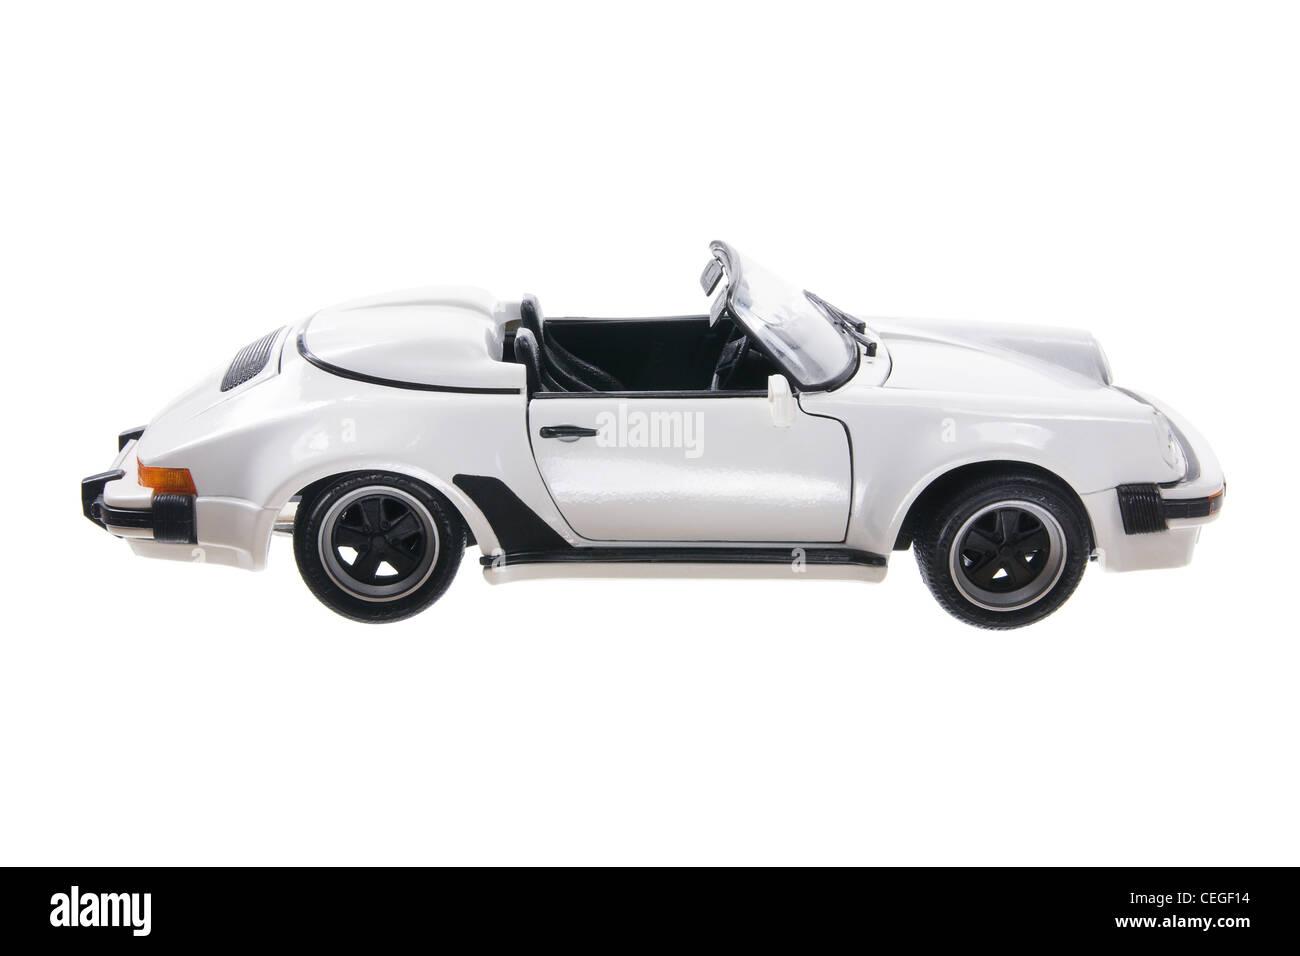 Miniature Car Model - Stock Image